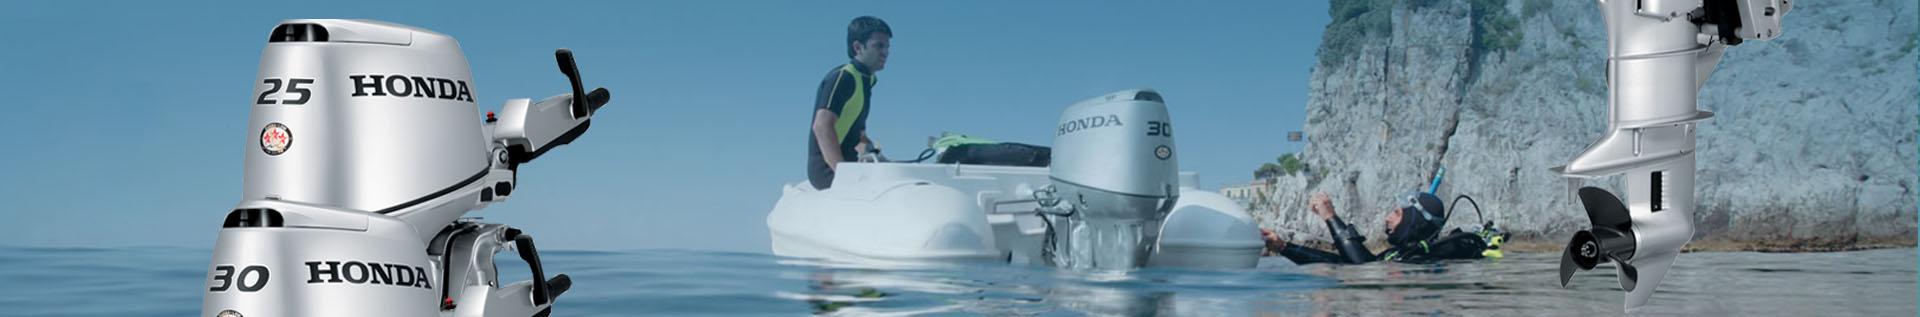 Honda Outboard Motors For Sale